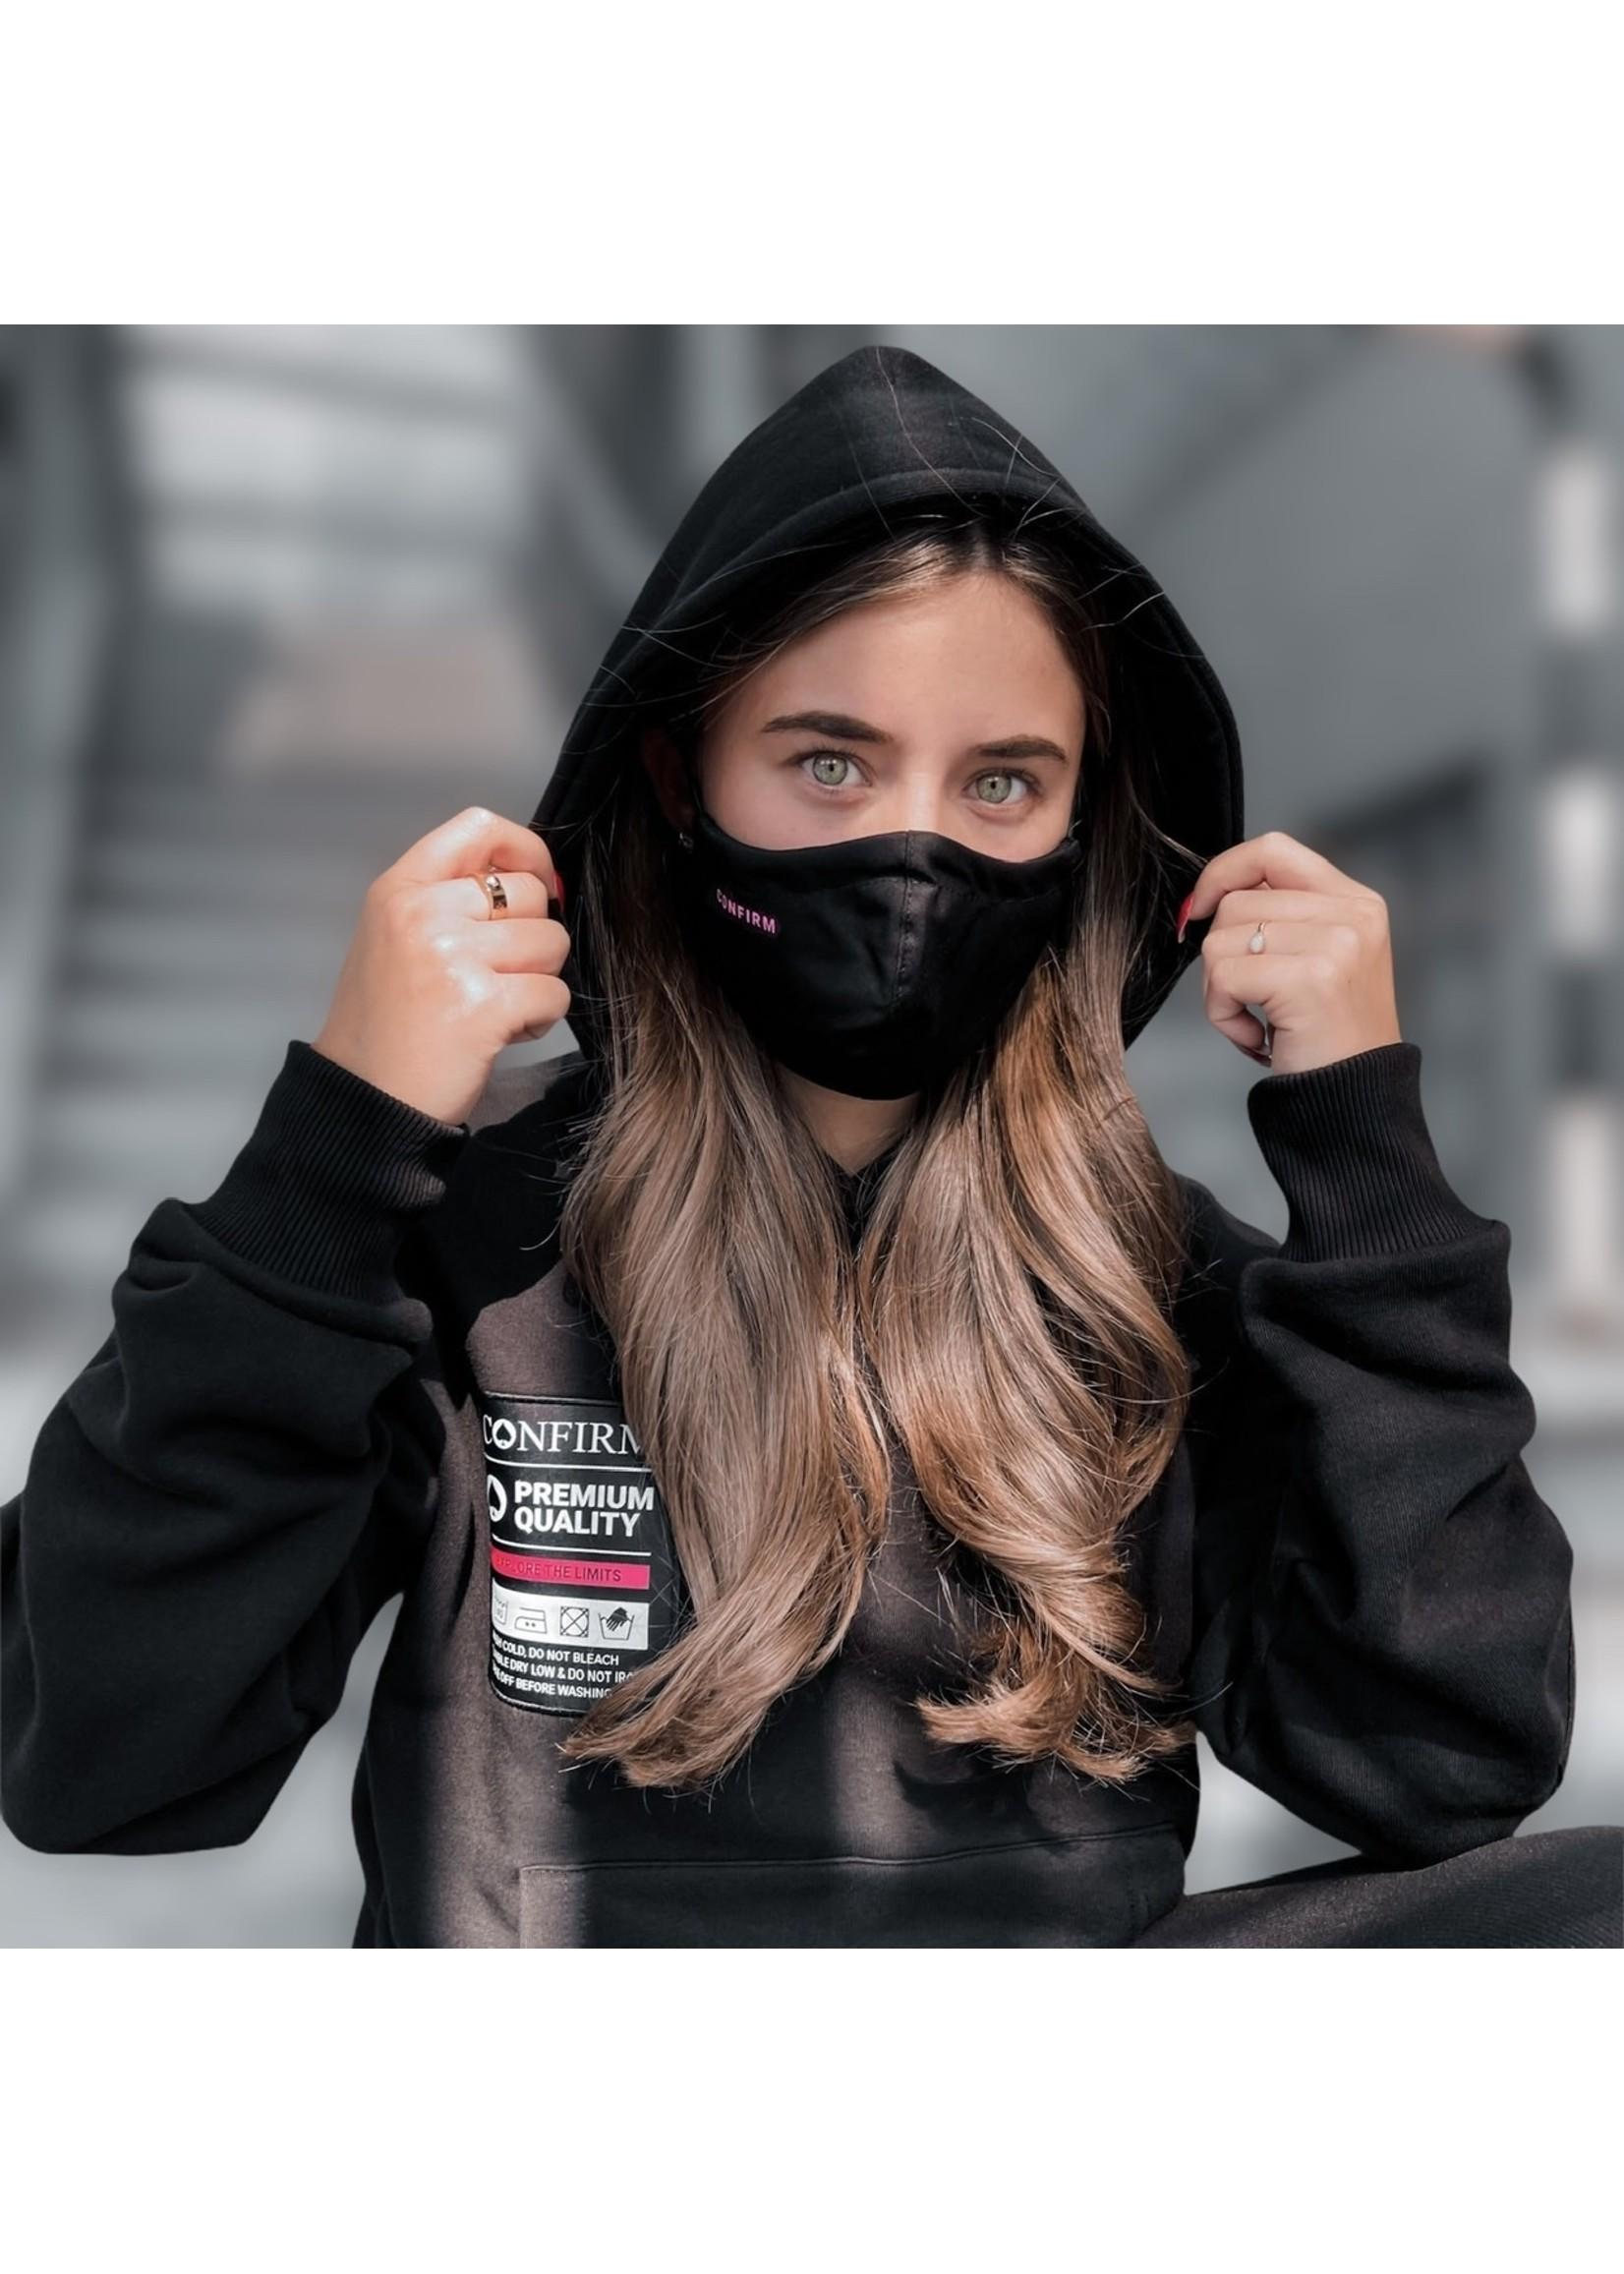 Confirm mask 2-pack - black/fuchsia